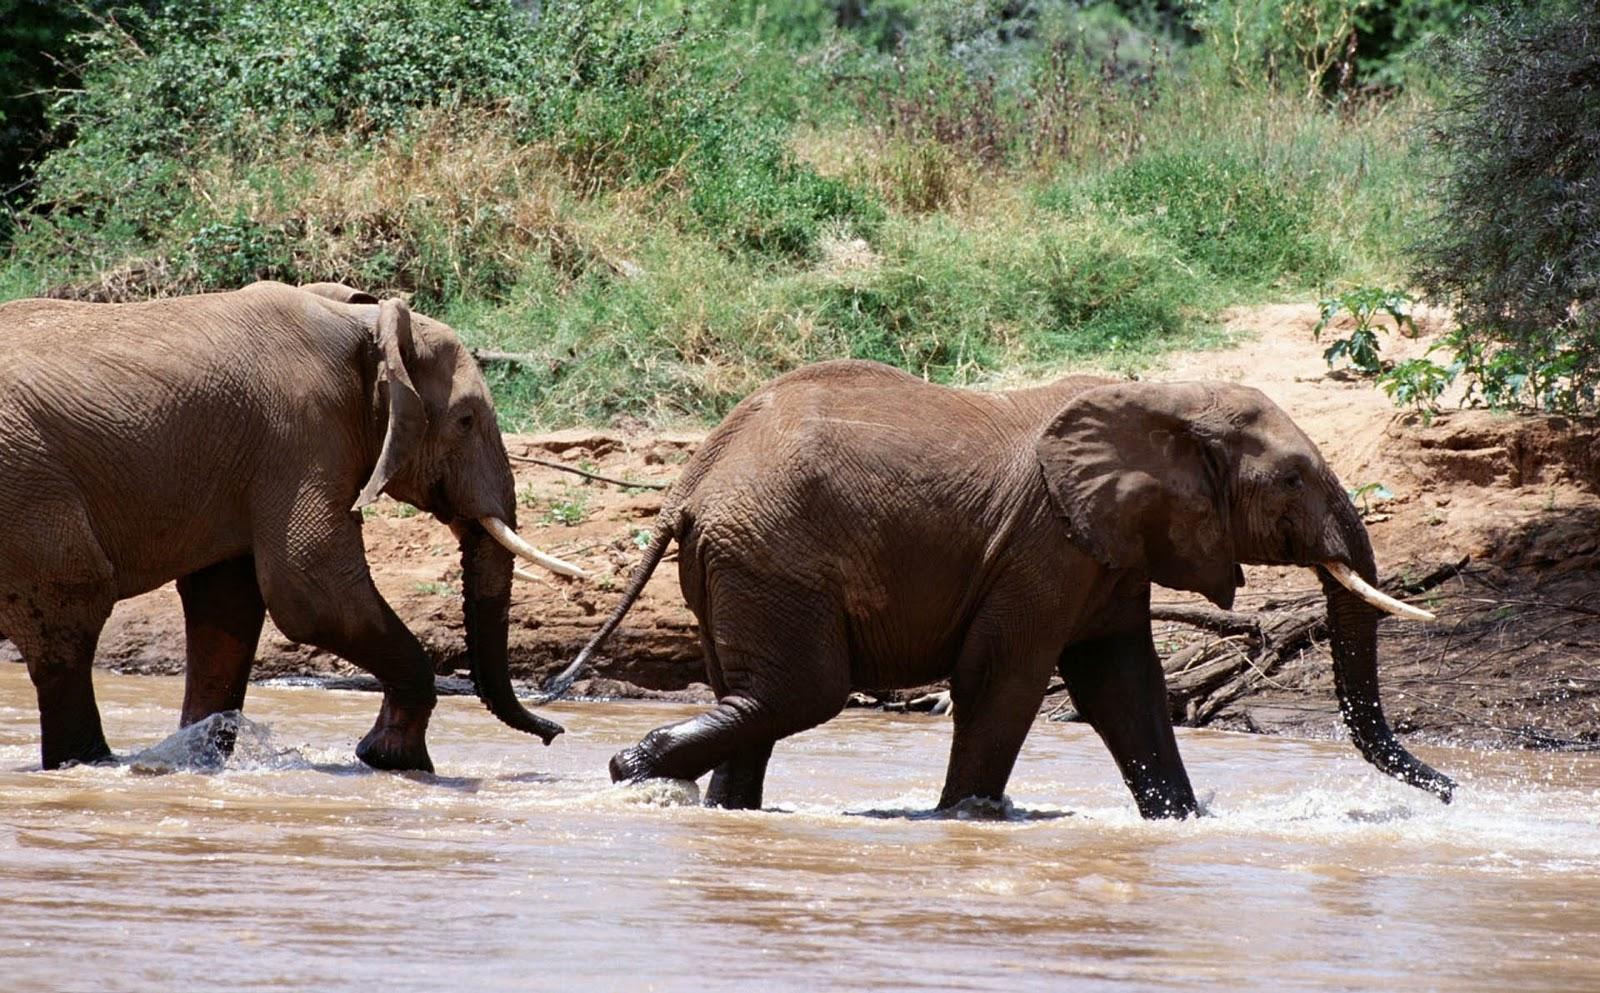 elephants wallpapers world - photo #27